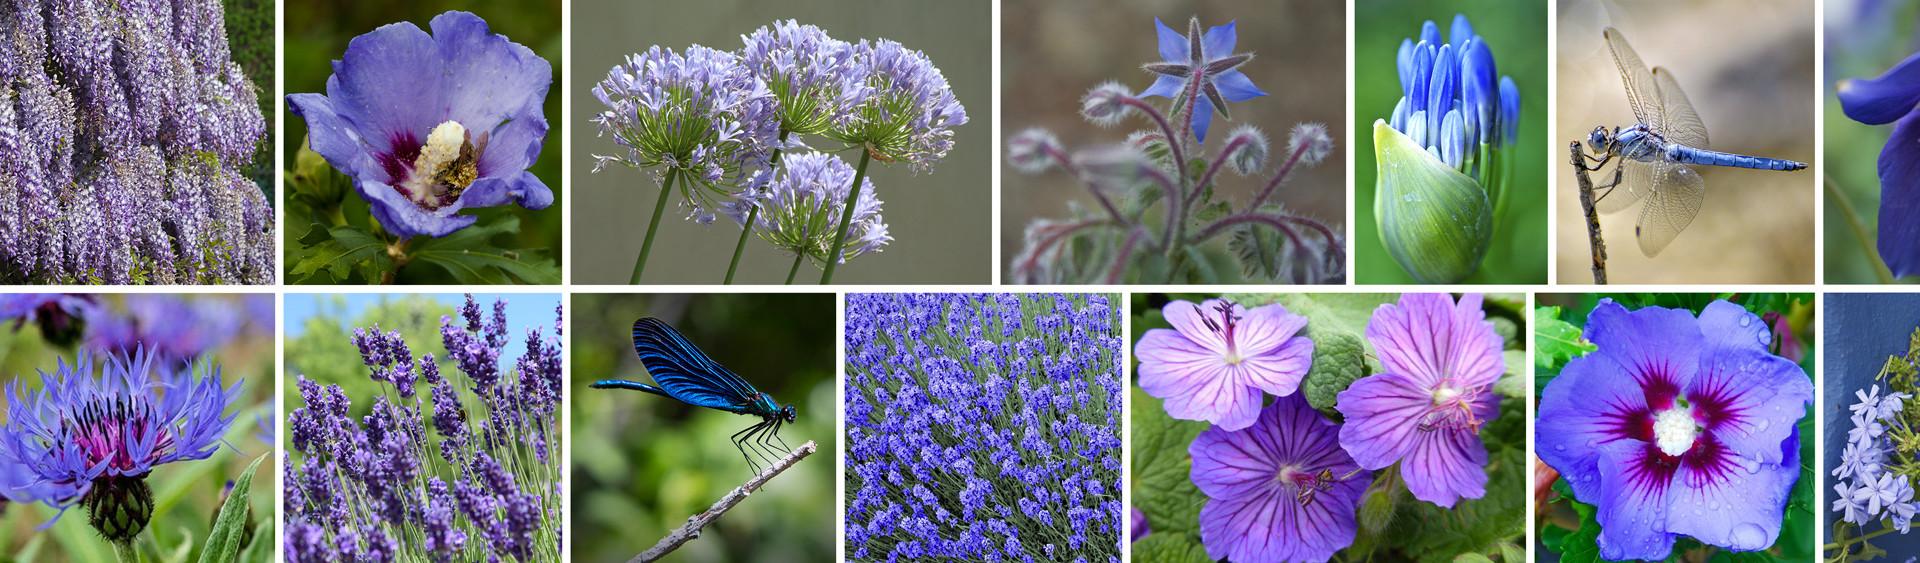 Fleurs-bleues-Poster-web.jpg